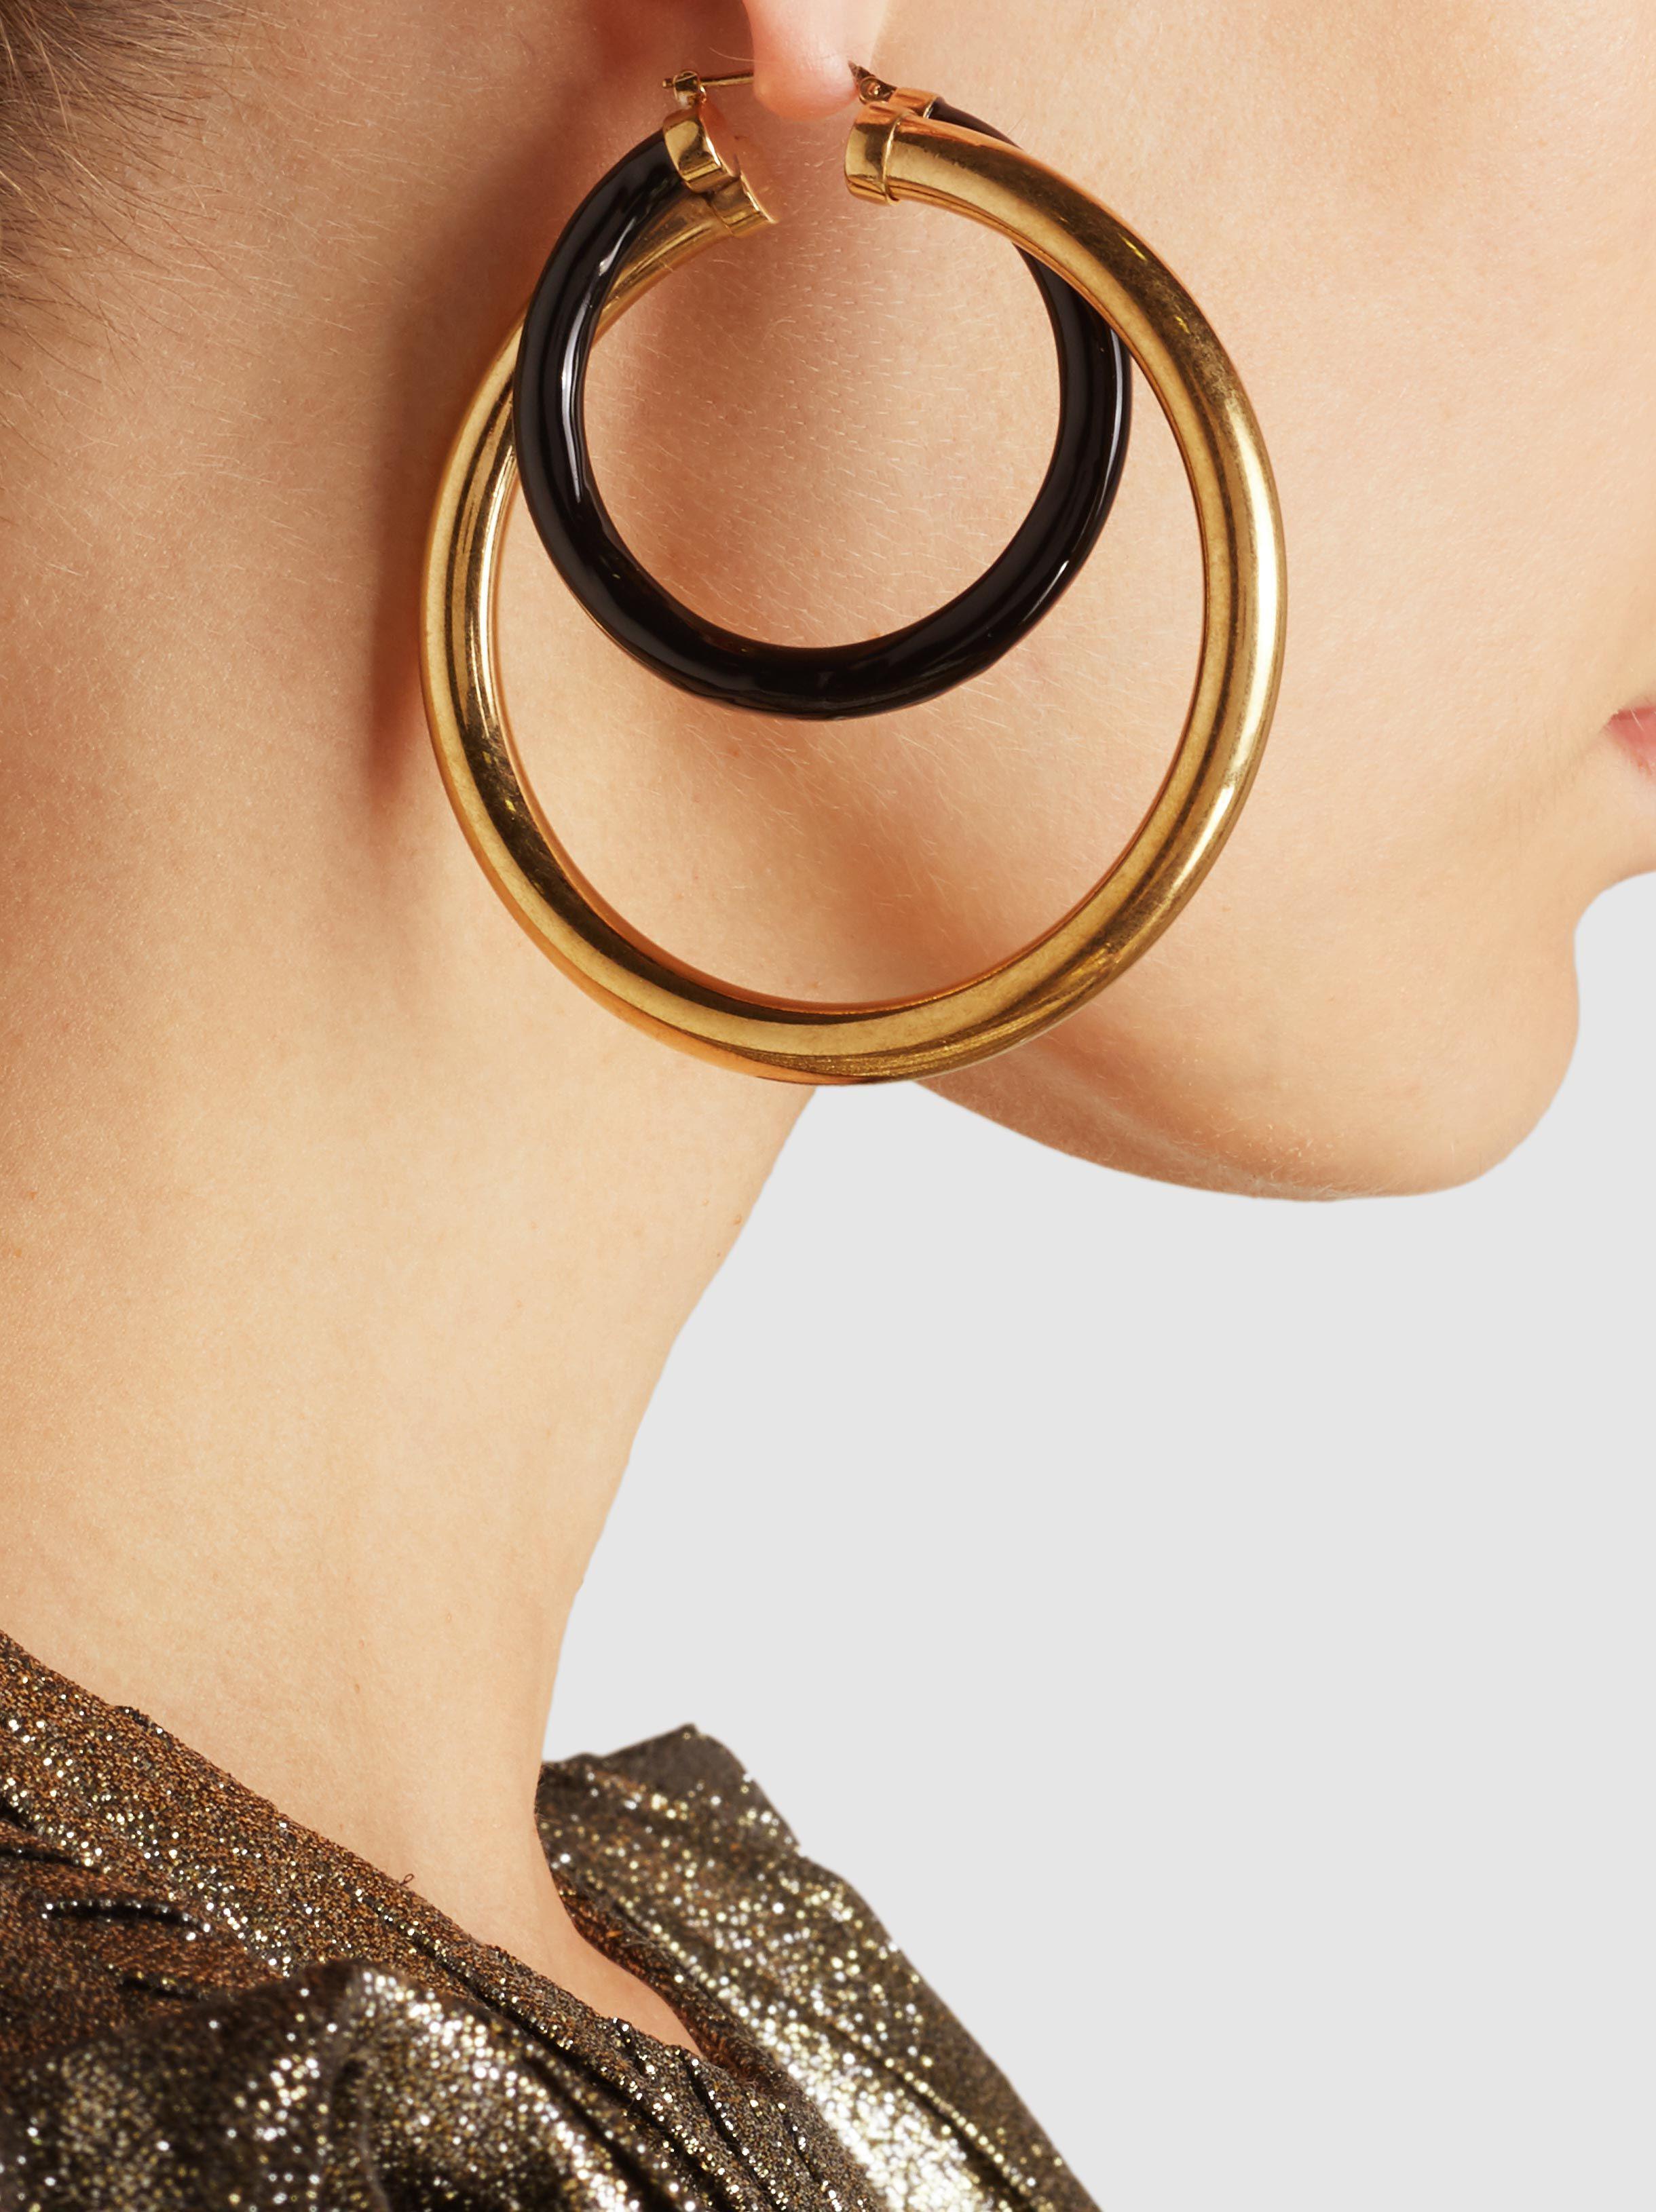 Peter Pilotto Large double hoop earrings Xk10hc